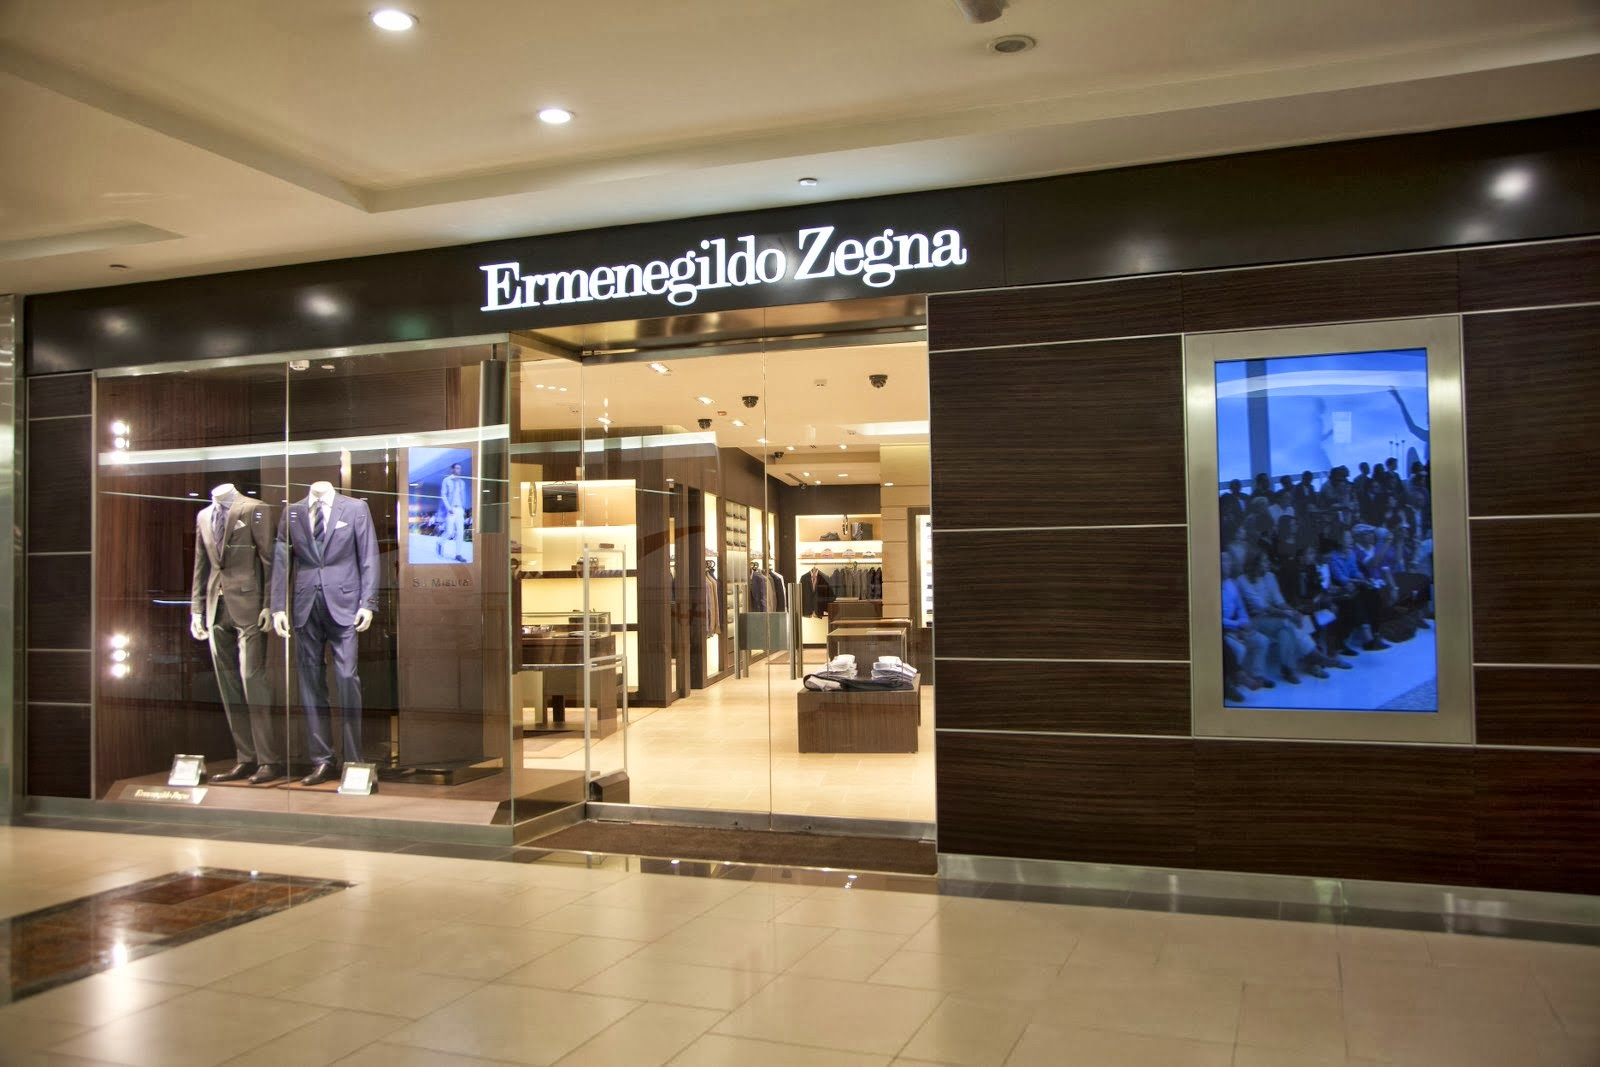 hot sale online de0ca 63107 The Shoppinguide.it: Outlet Ermenegildo Zegna tutti i punti ...